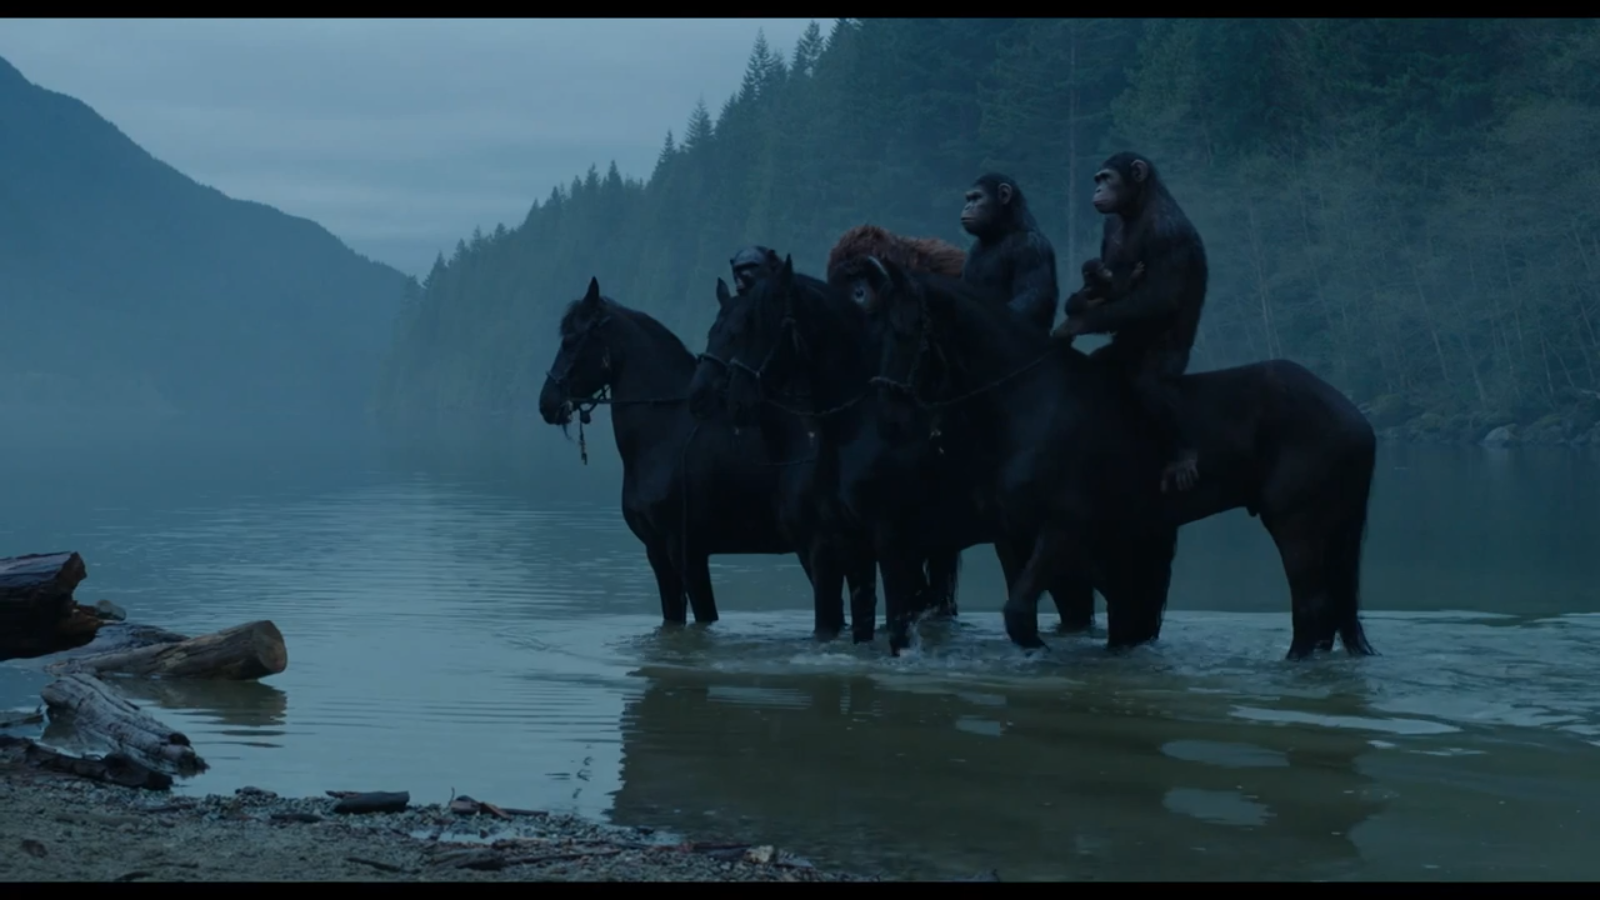 Apes horseback